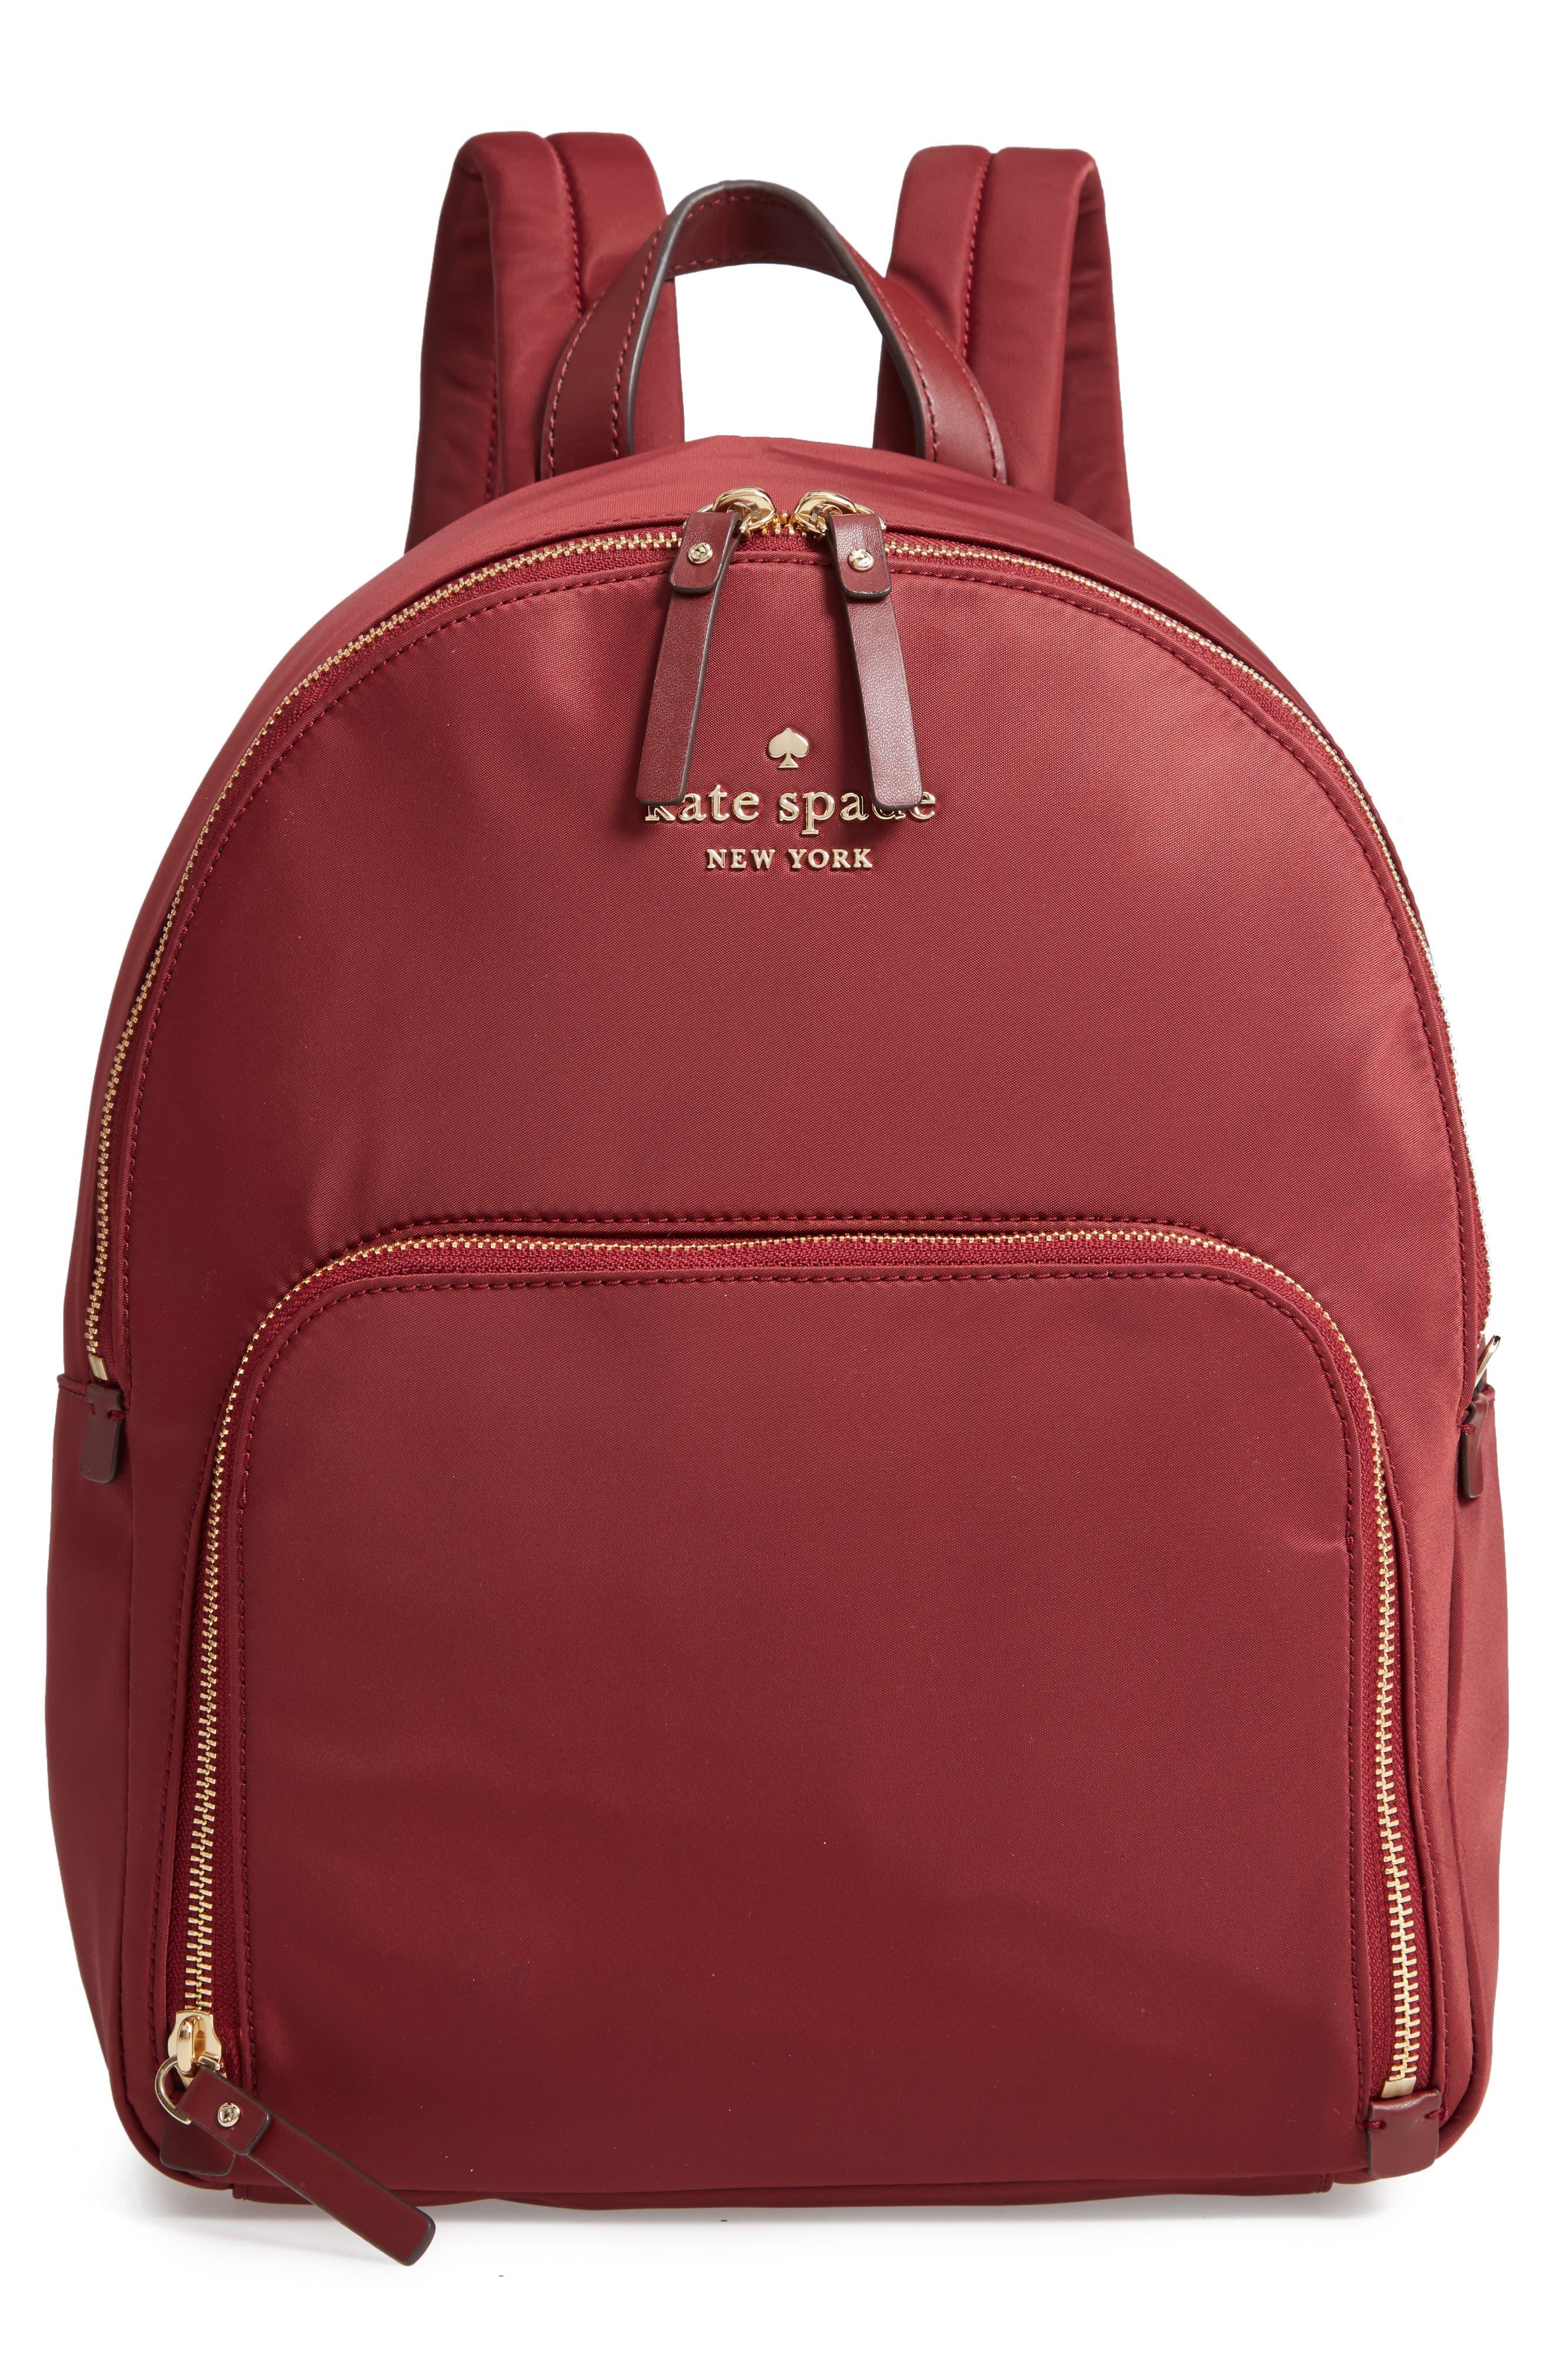 watson lane - hartley nylon backpack,                             Main thumbnail 1, color,                             DARK CURRANT